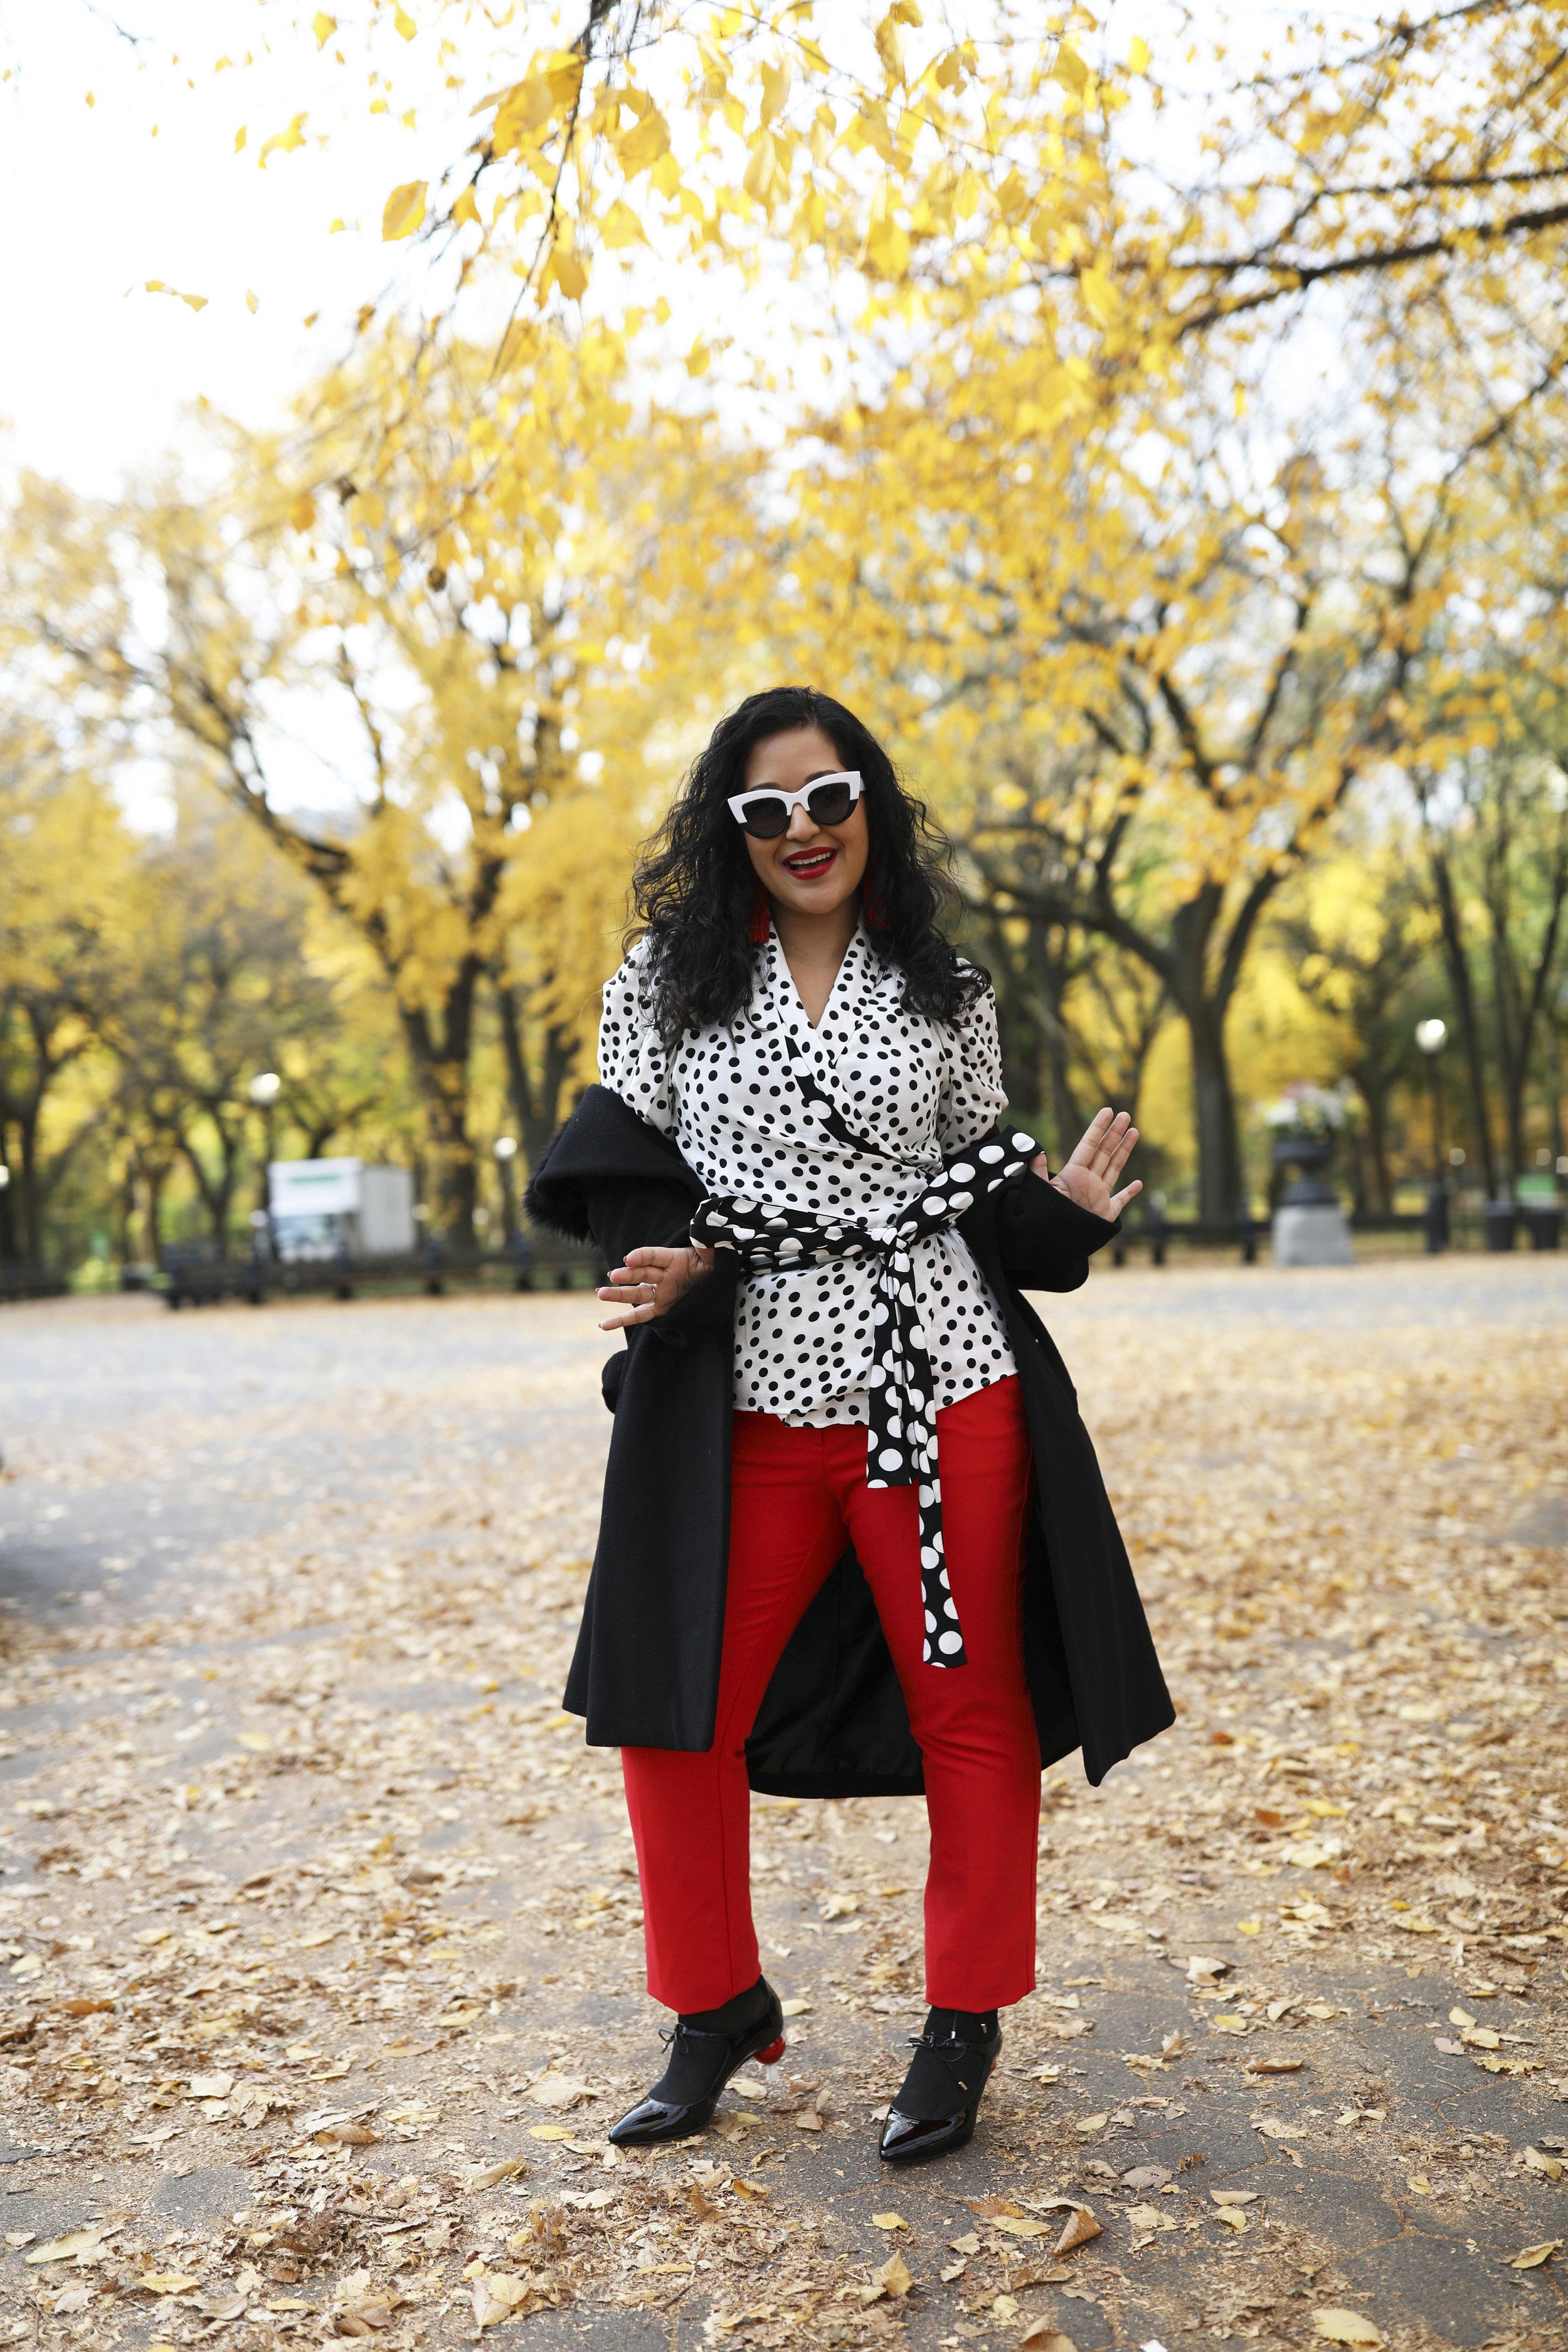 Krity S x Fall Work Outfit x Polka Dot6.jpg